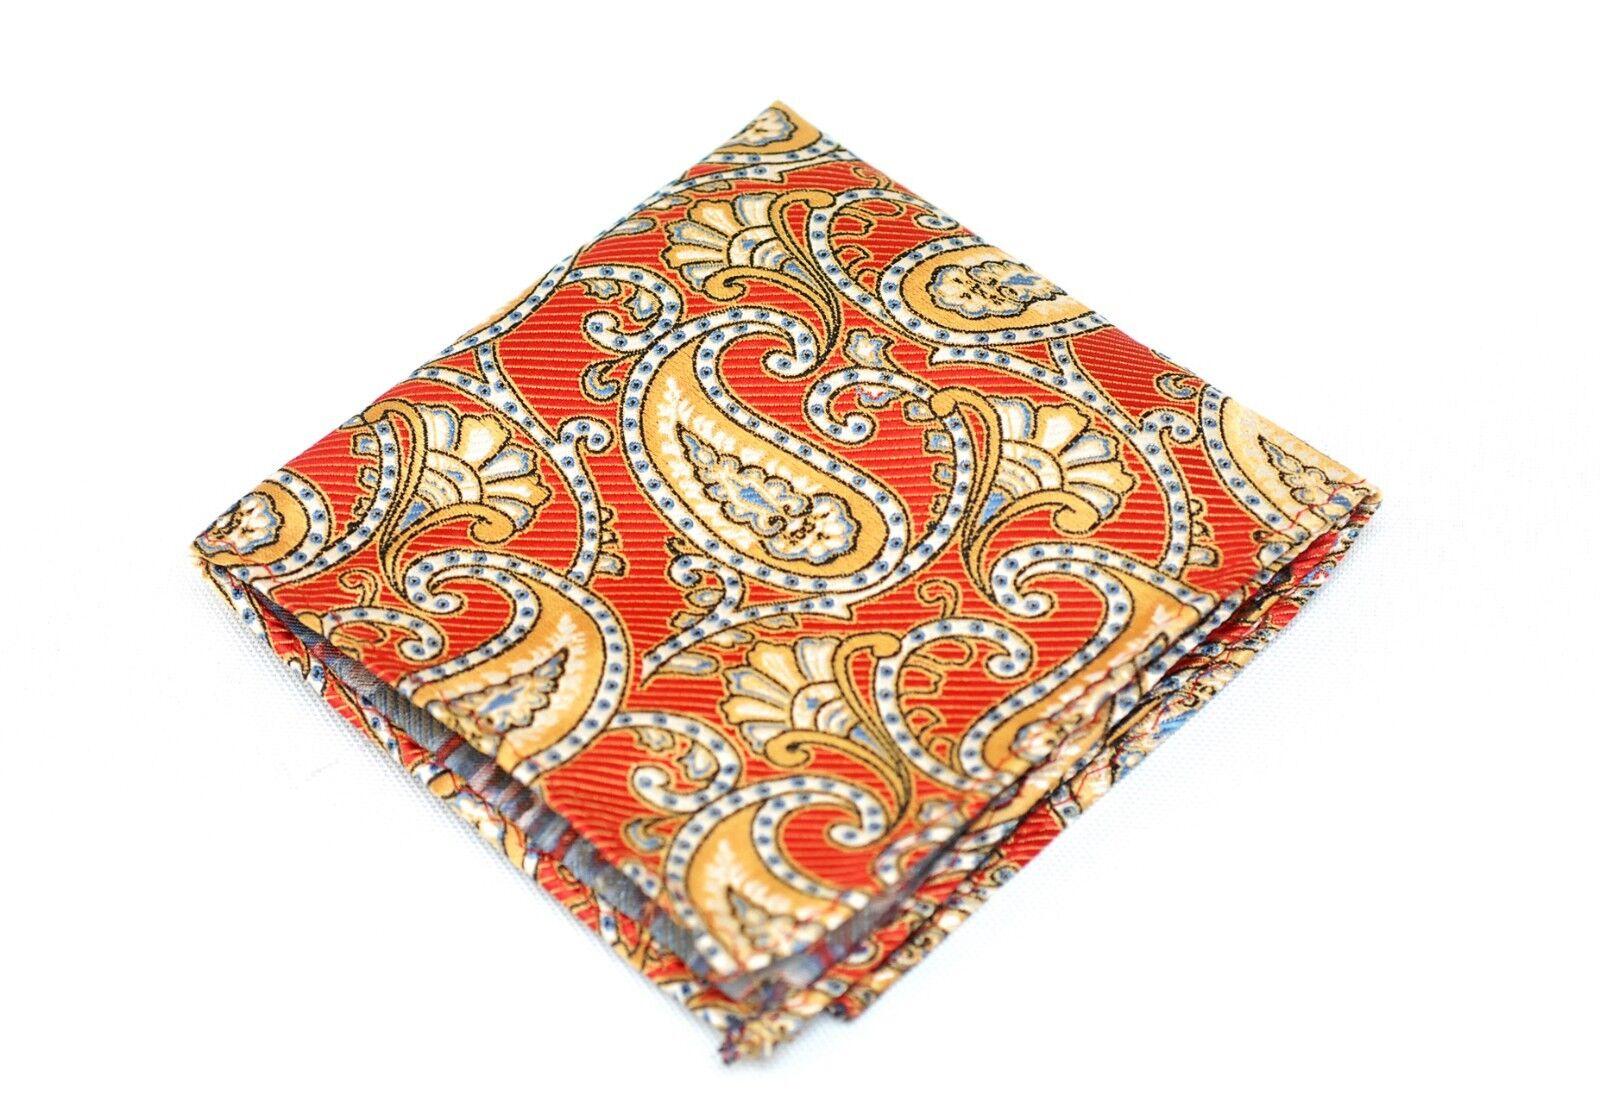 Lord R Colton Masterworks Pocket Square - Cafayate Red Silk - Retail New